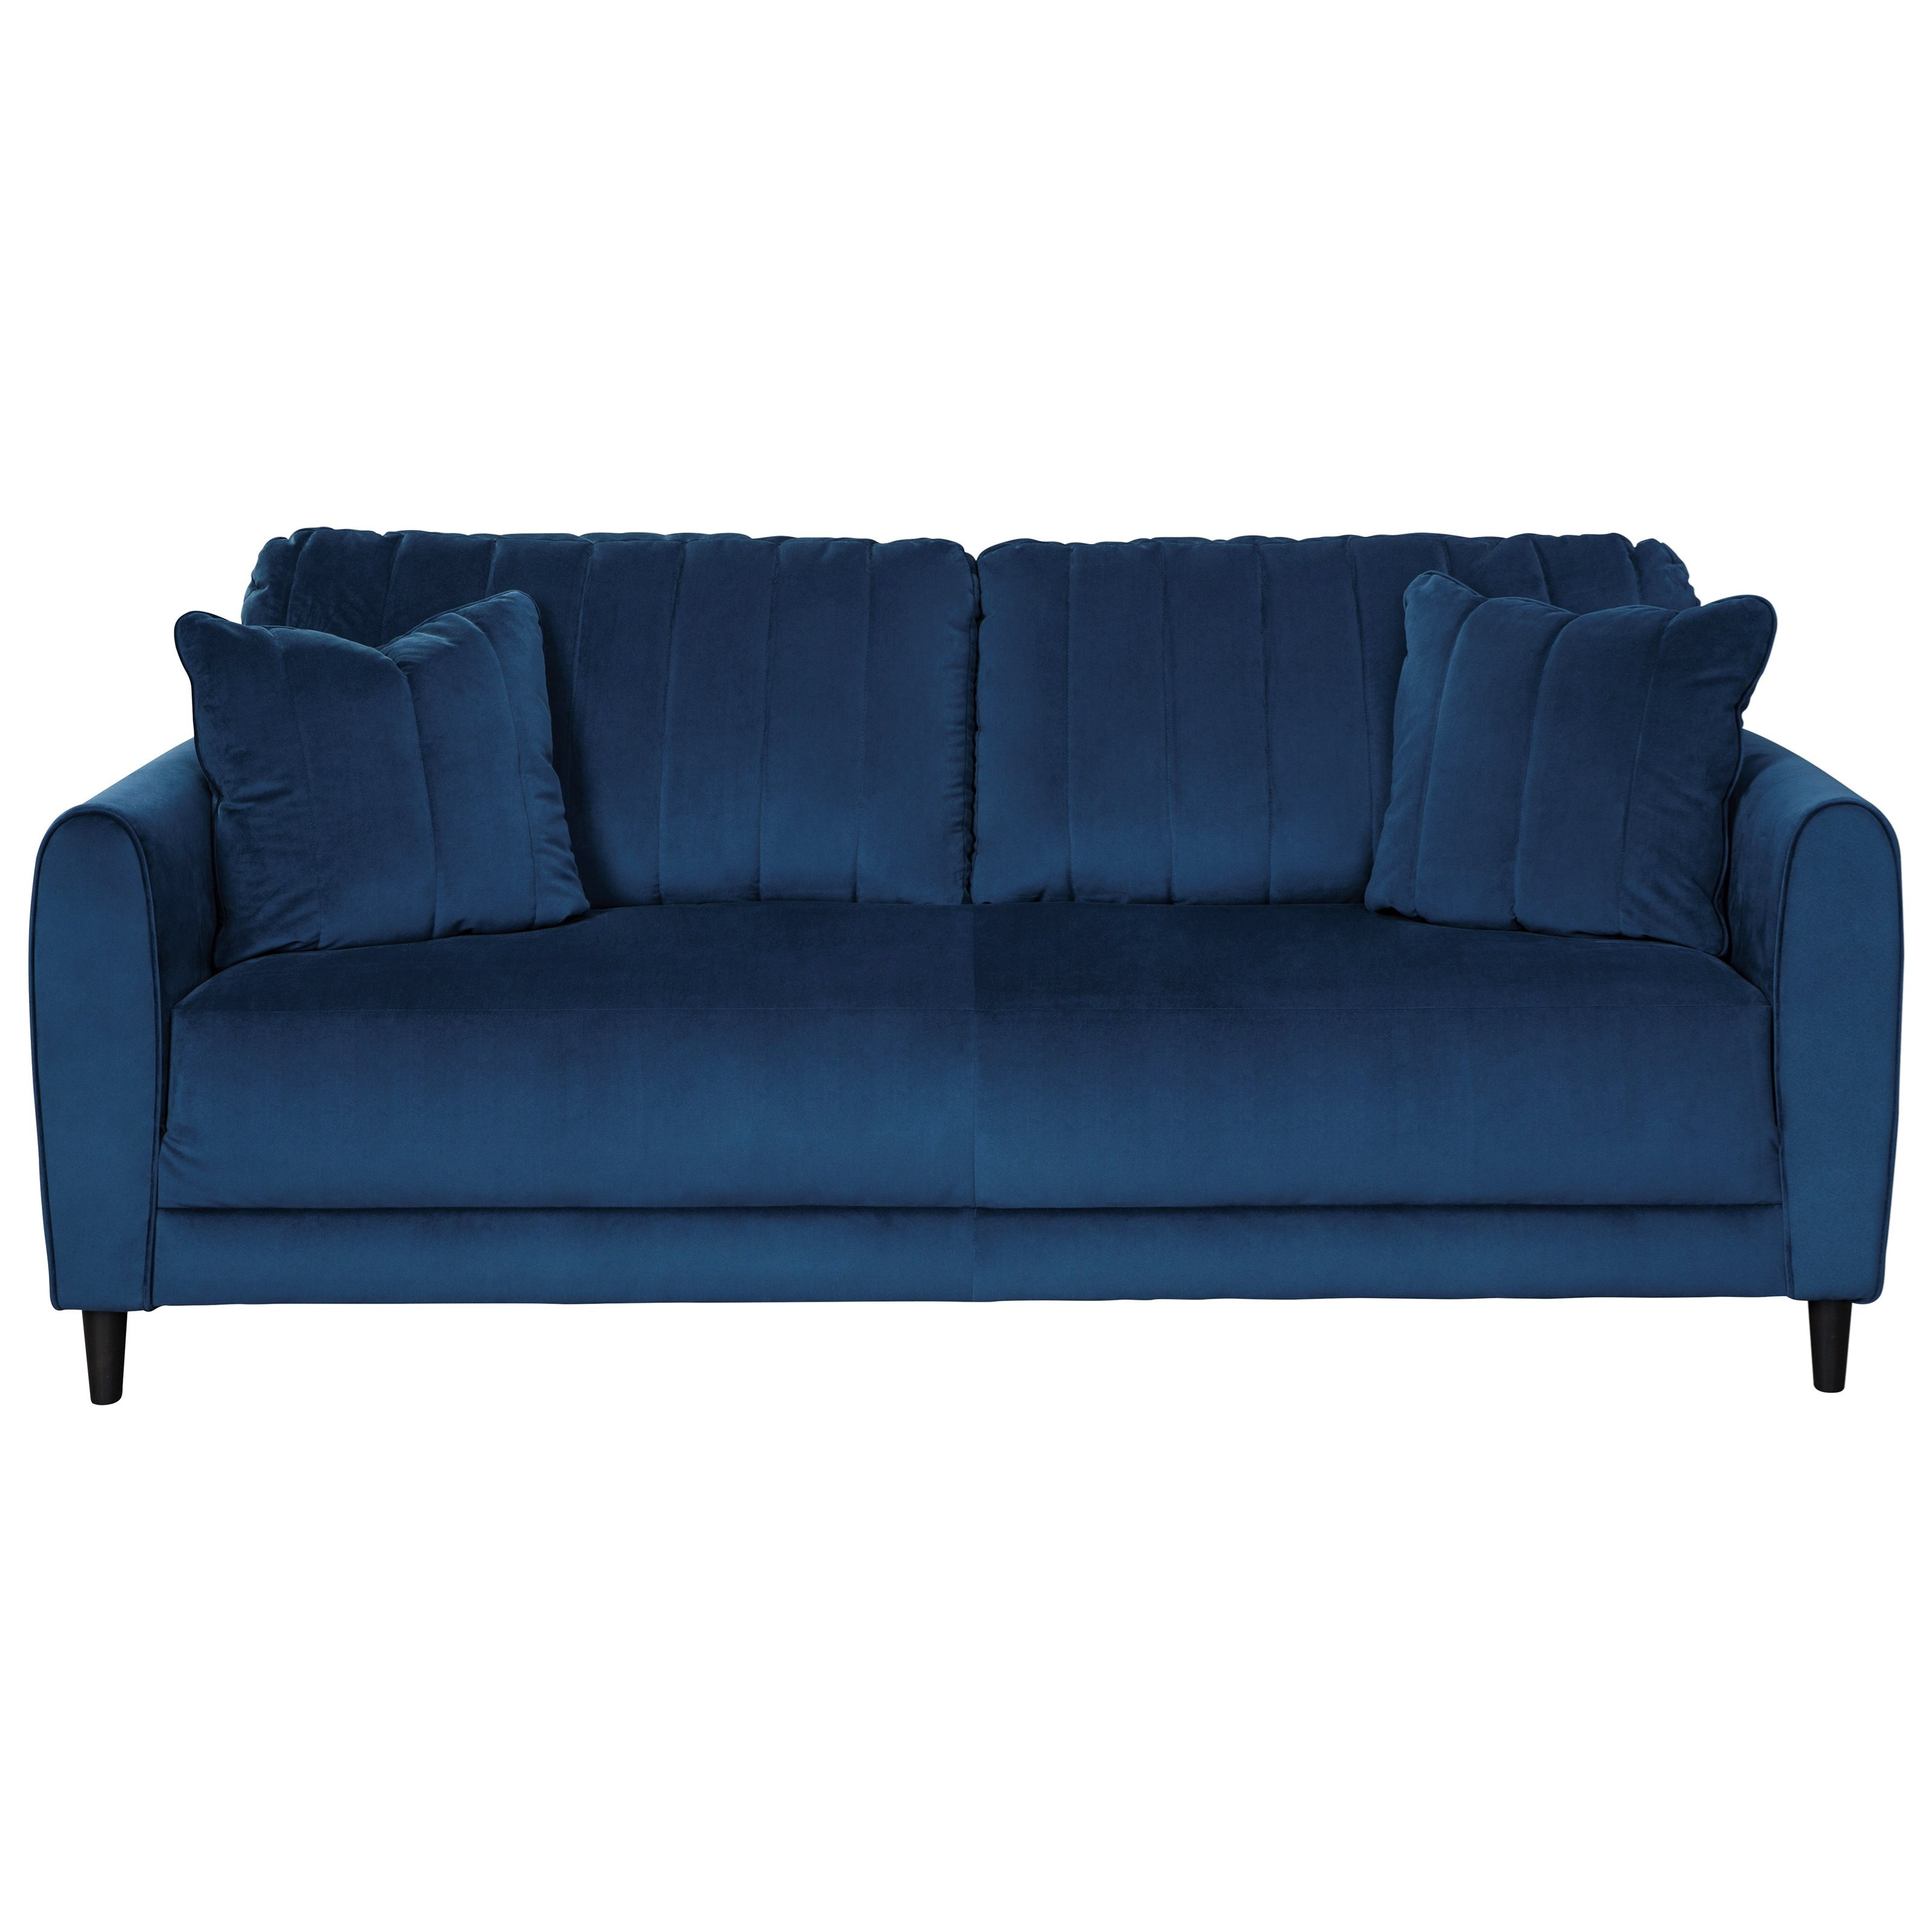 Enderlin Sofa by Signature at Walker's Furniture